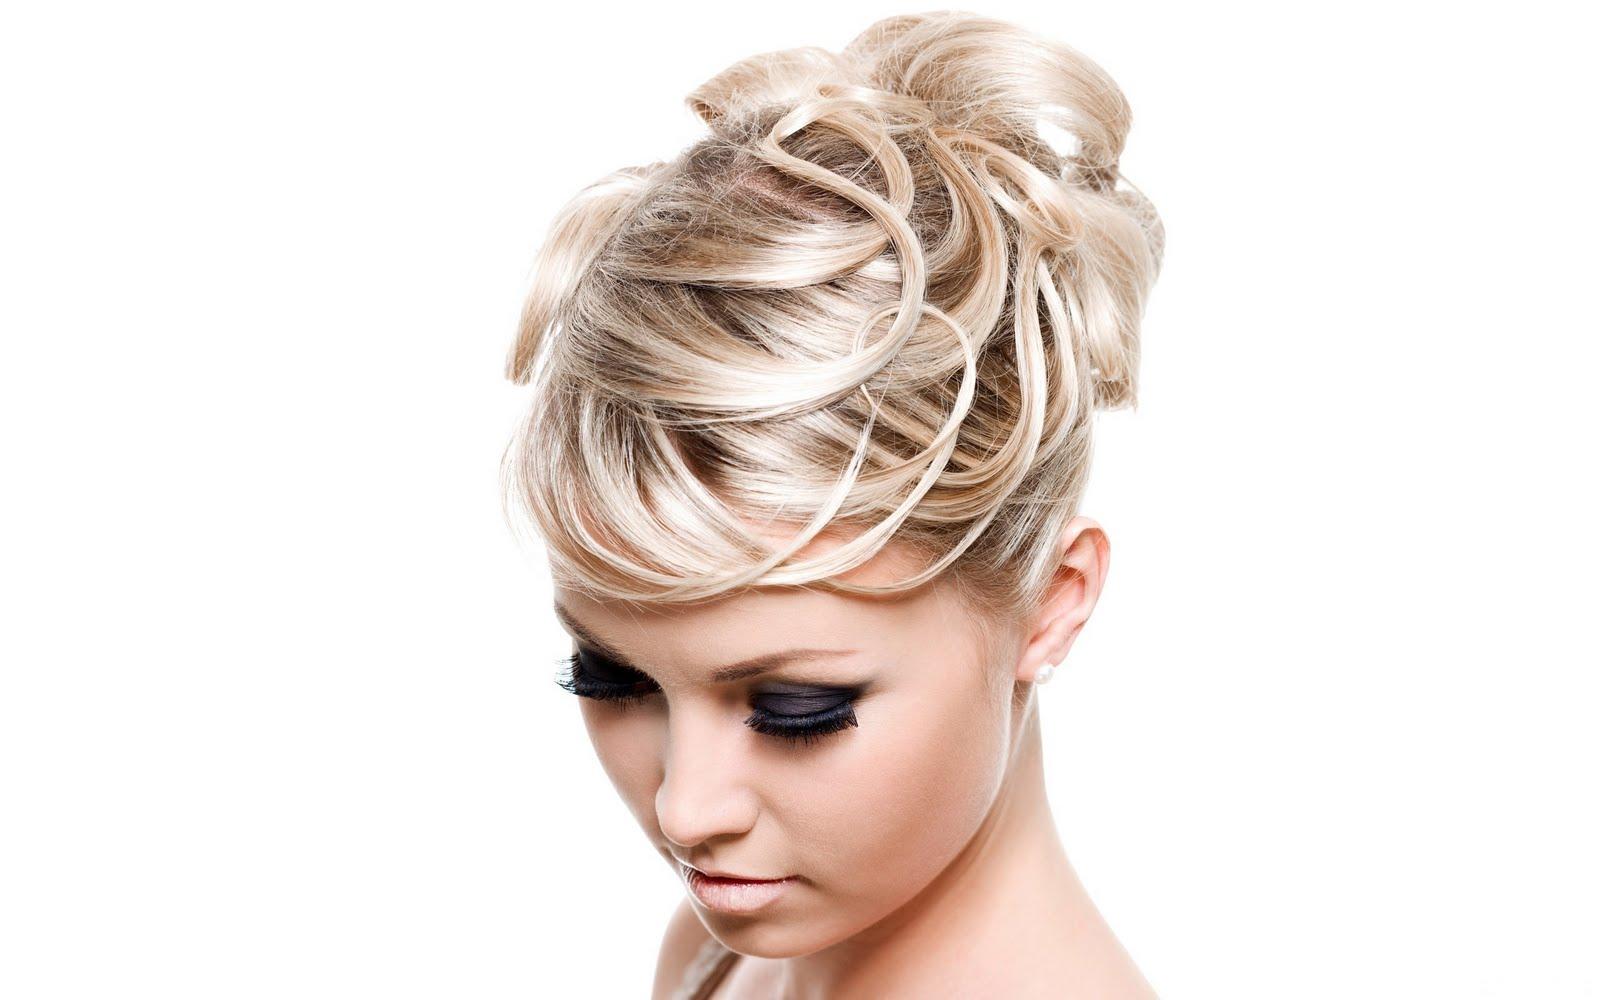 http://2.bp.blogspot.com/-iP2EUnvJFJ8/TnaO2J4HG7I/AAAAAAAAAVU/YDBGvSYublI/s1600/Beautiful+Blonde+Girl+Nice+Haircut+-+UniqueWalls.Blogspot.Com.jpg